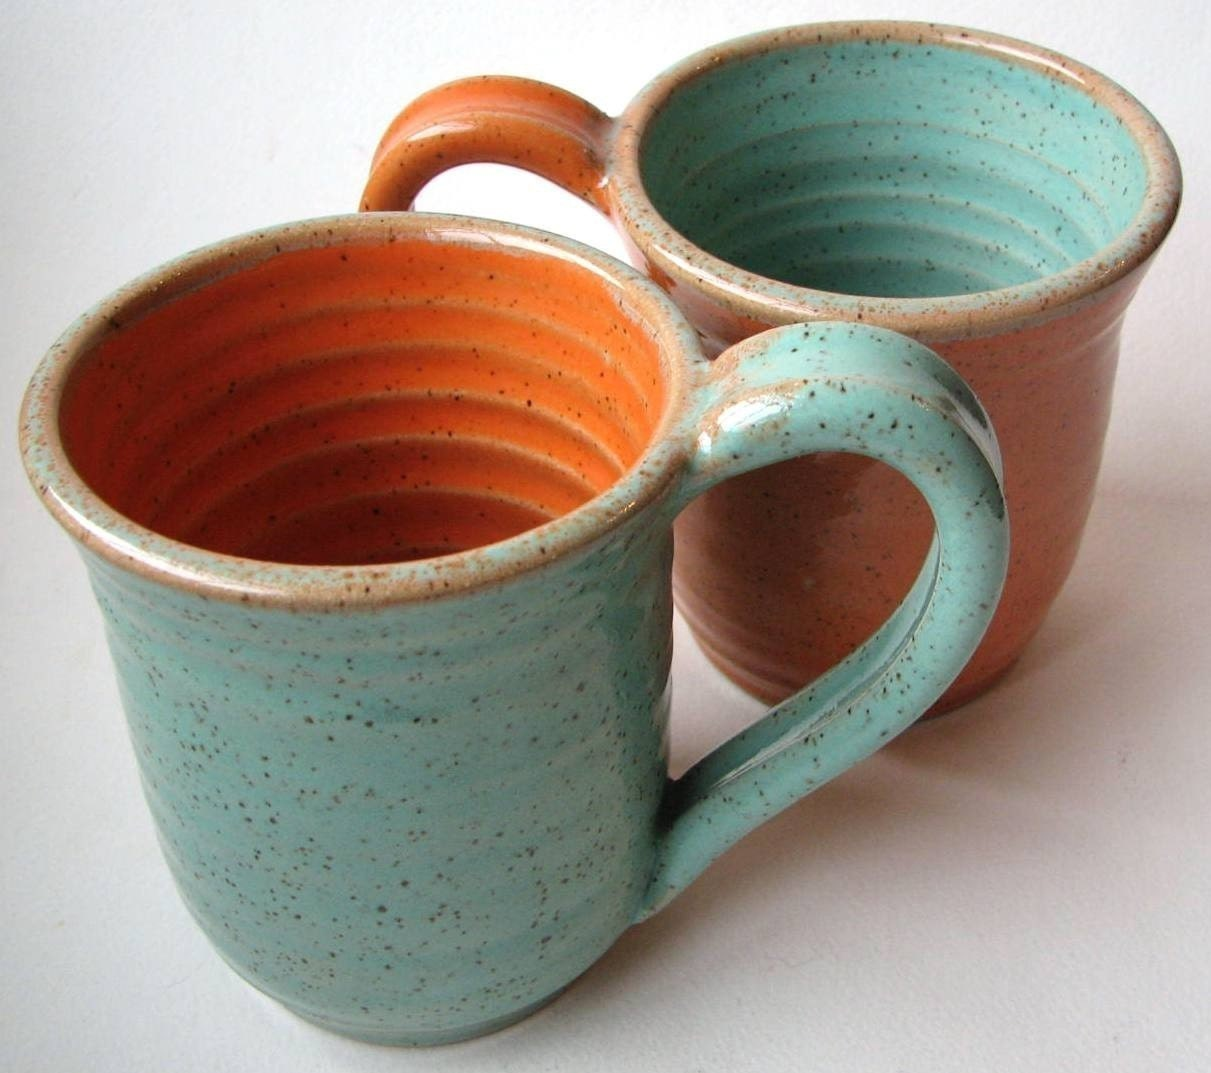 2 Mugs MADE TO ORDER Orange and Turquoise Mug and Turquoise and Orange Mug